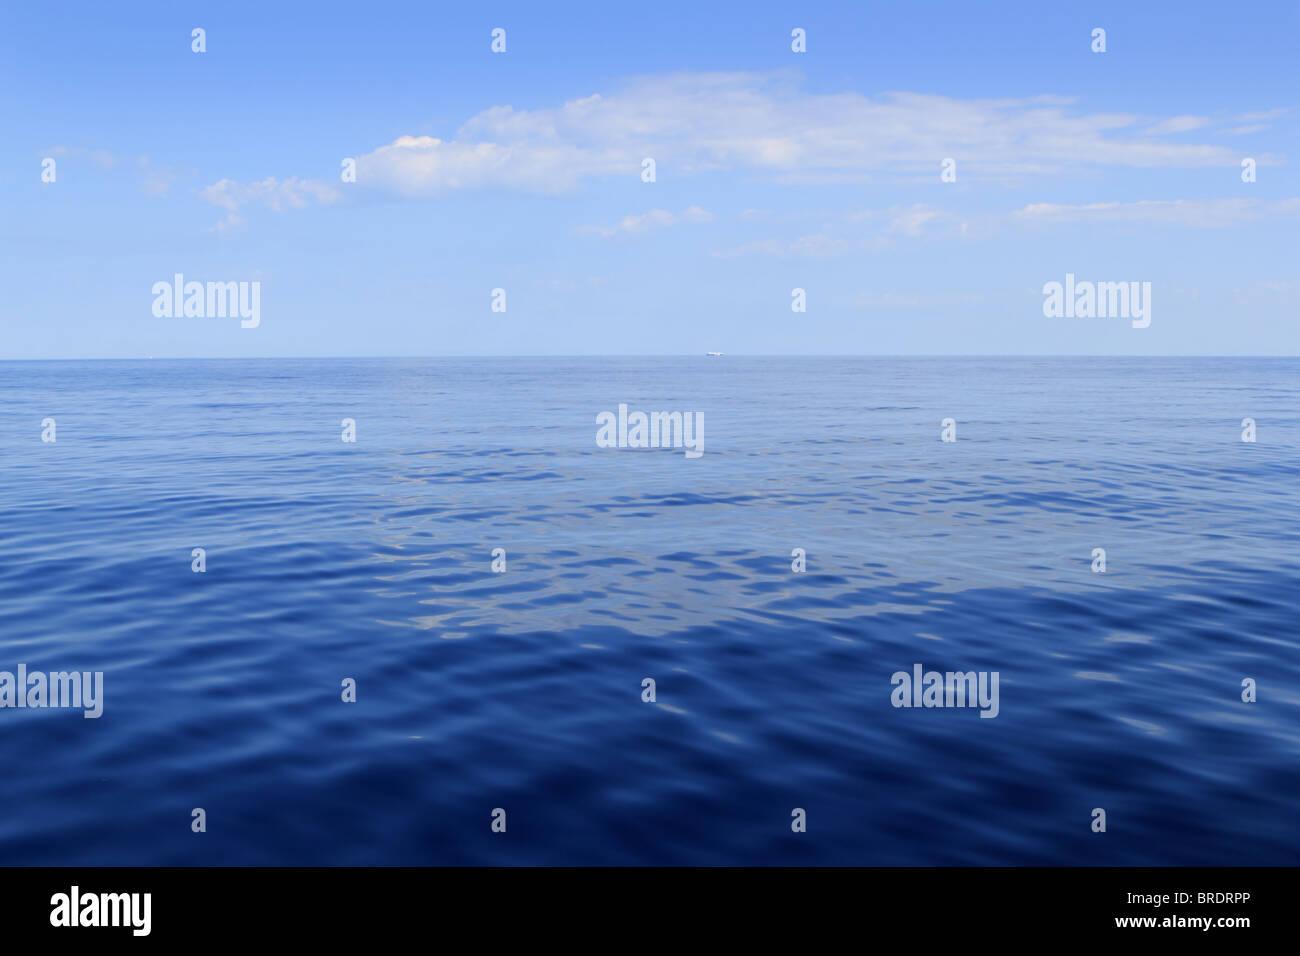 blue sea horizon ocean perfect in calm sunny day mediterranean - Stock Image